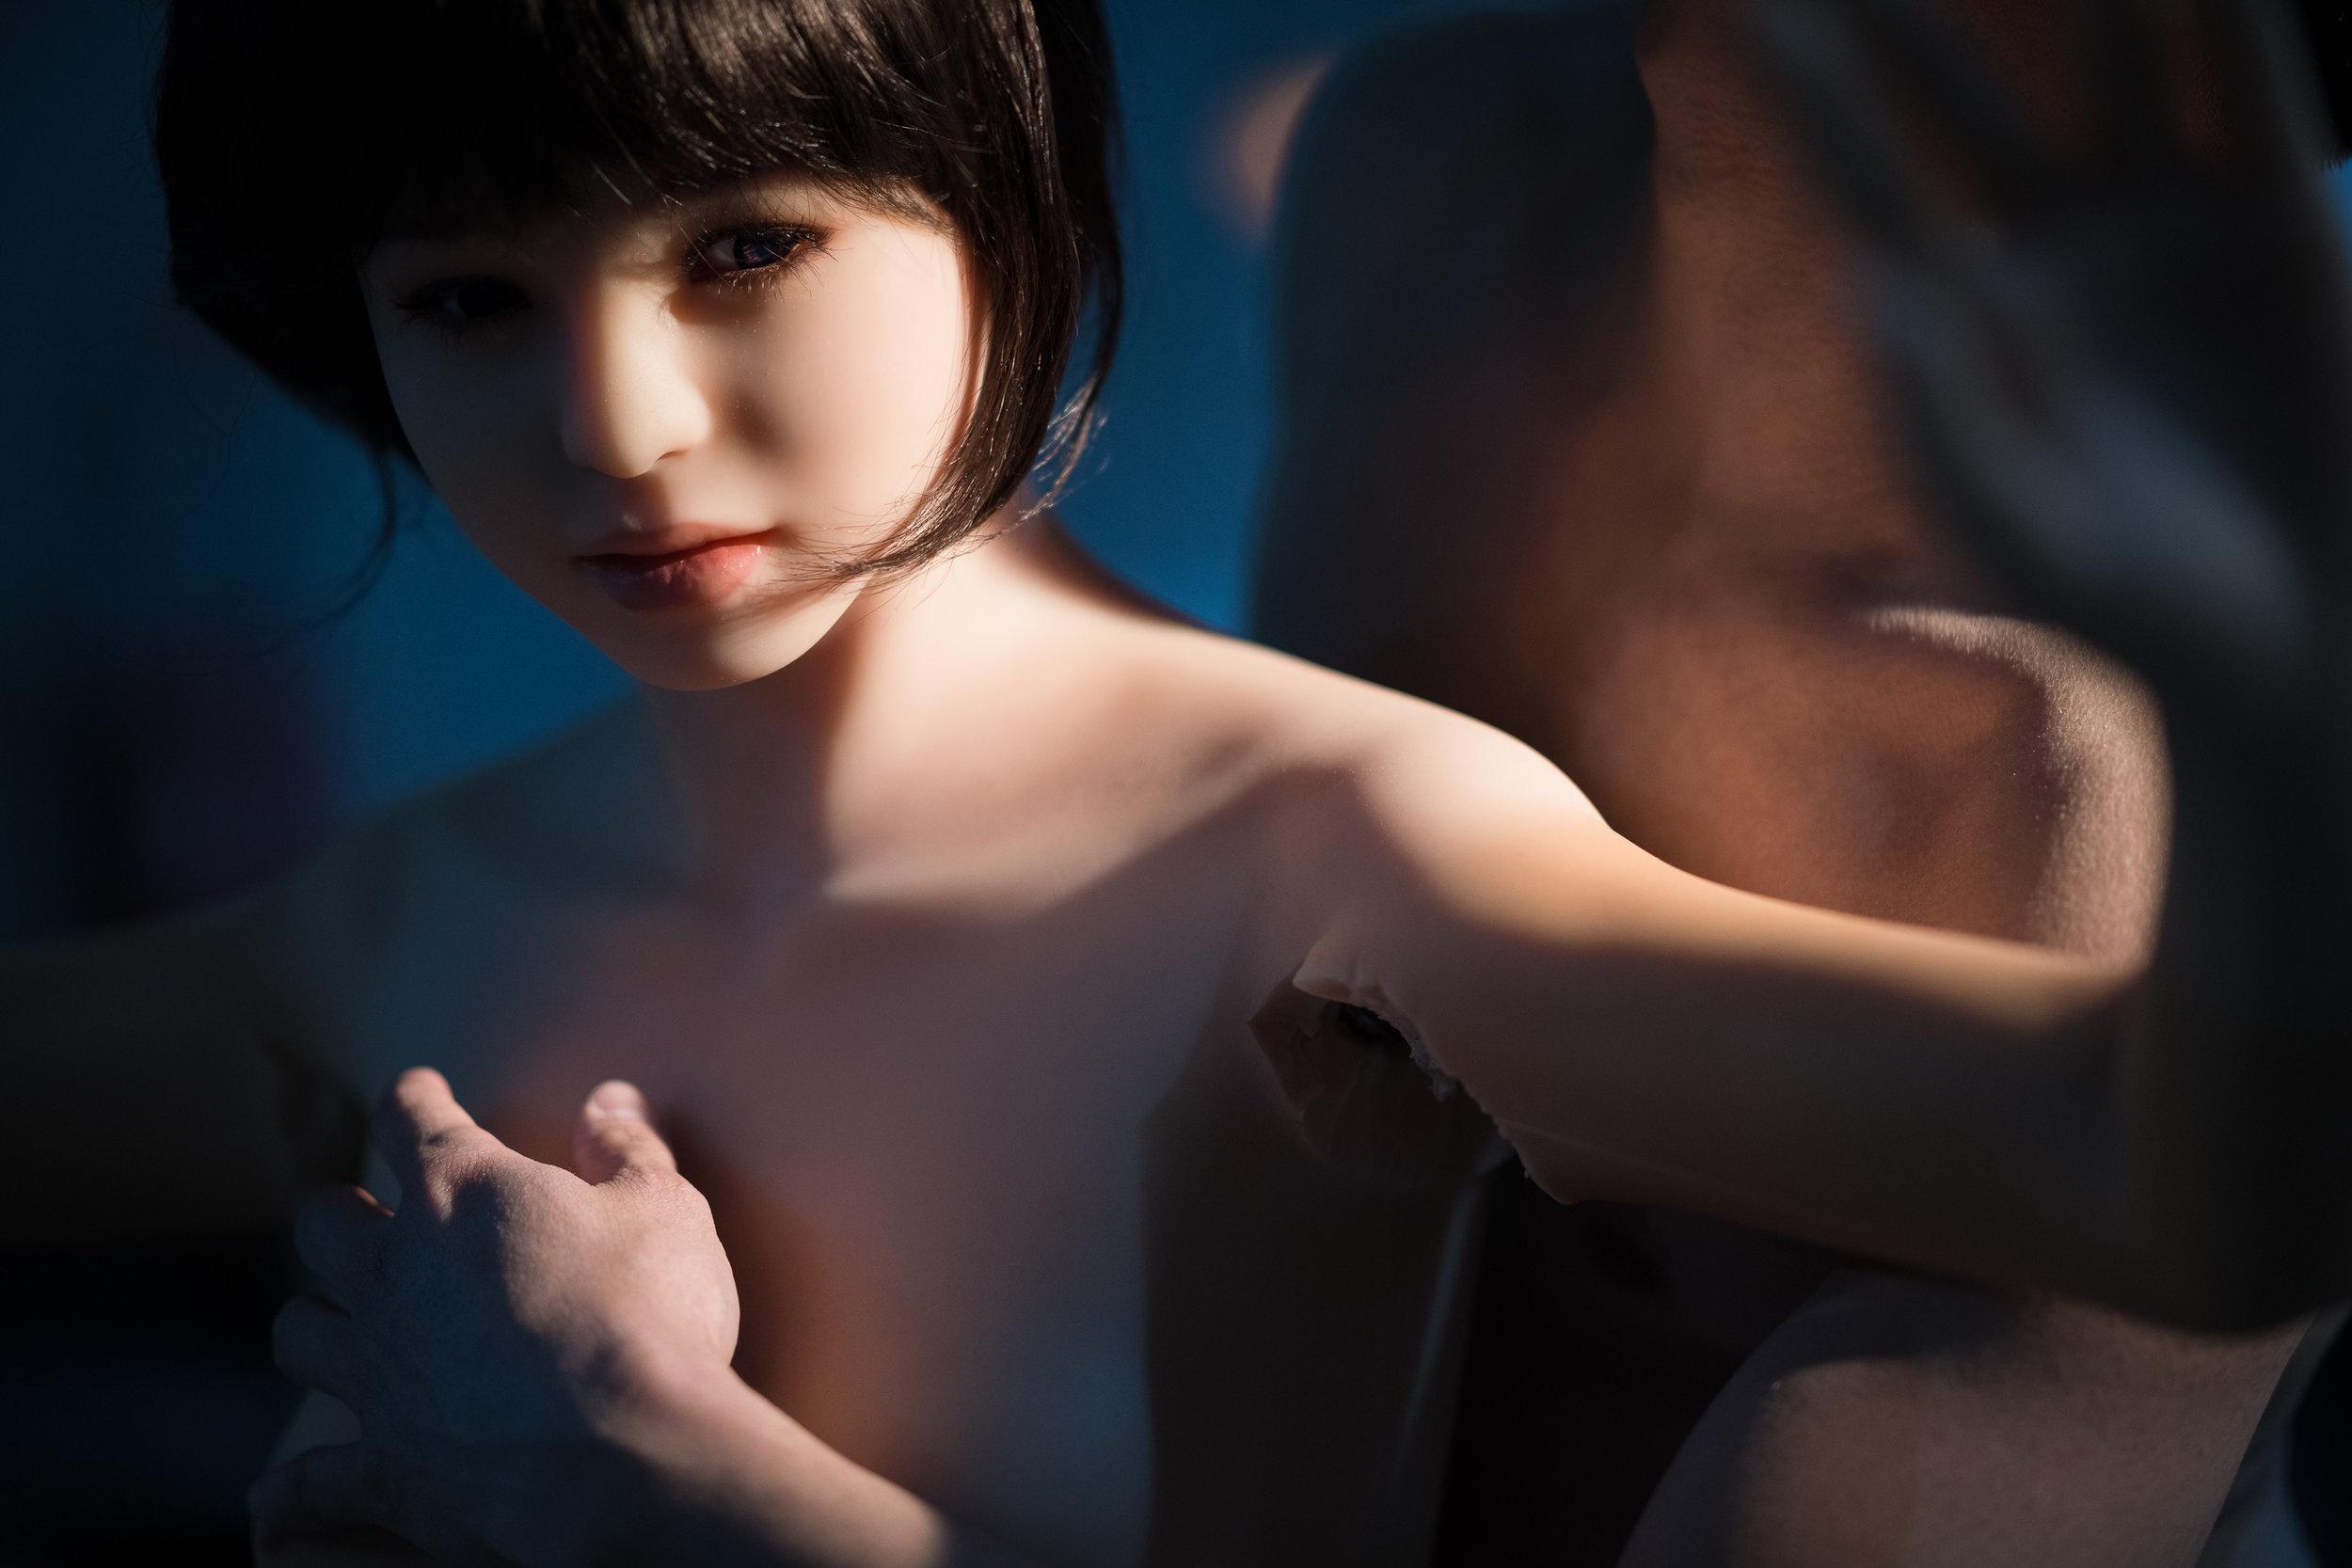 www.JuneKorea.com - 182219.jpg